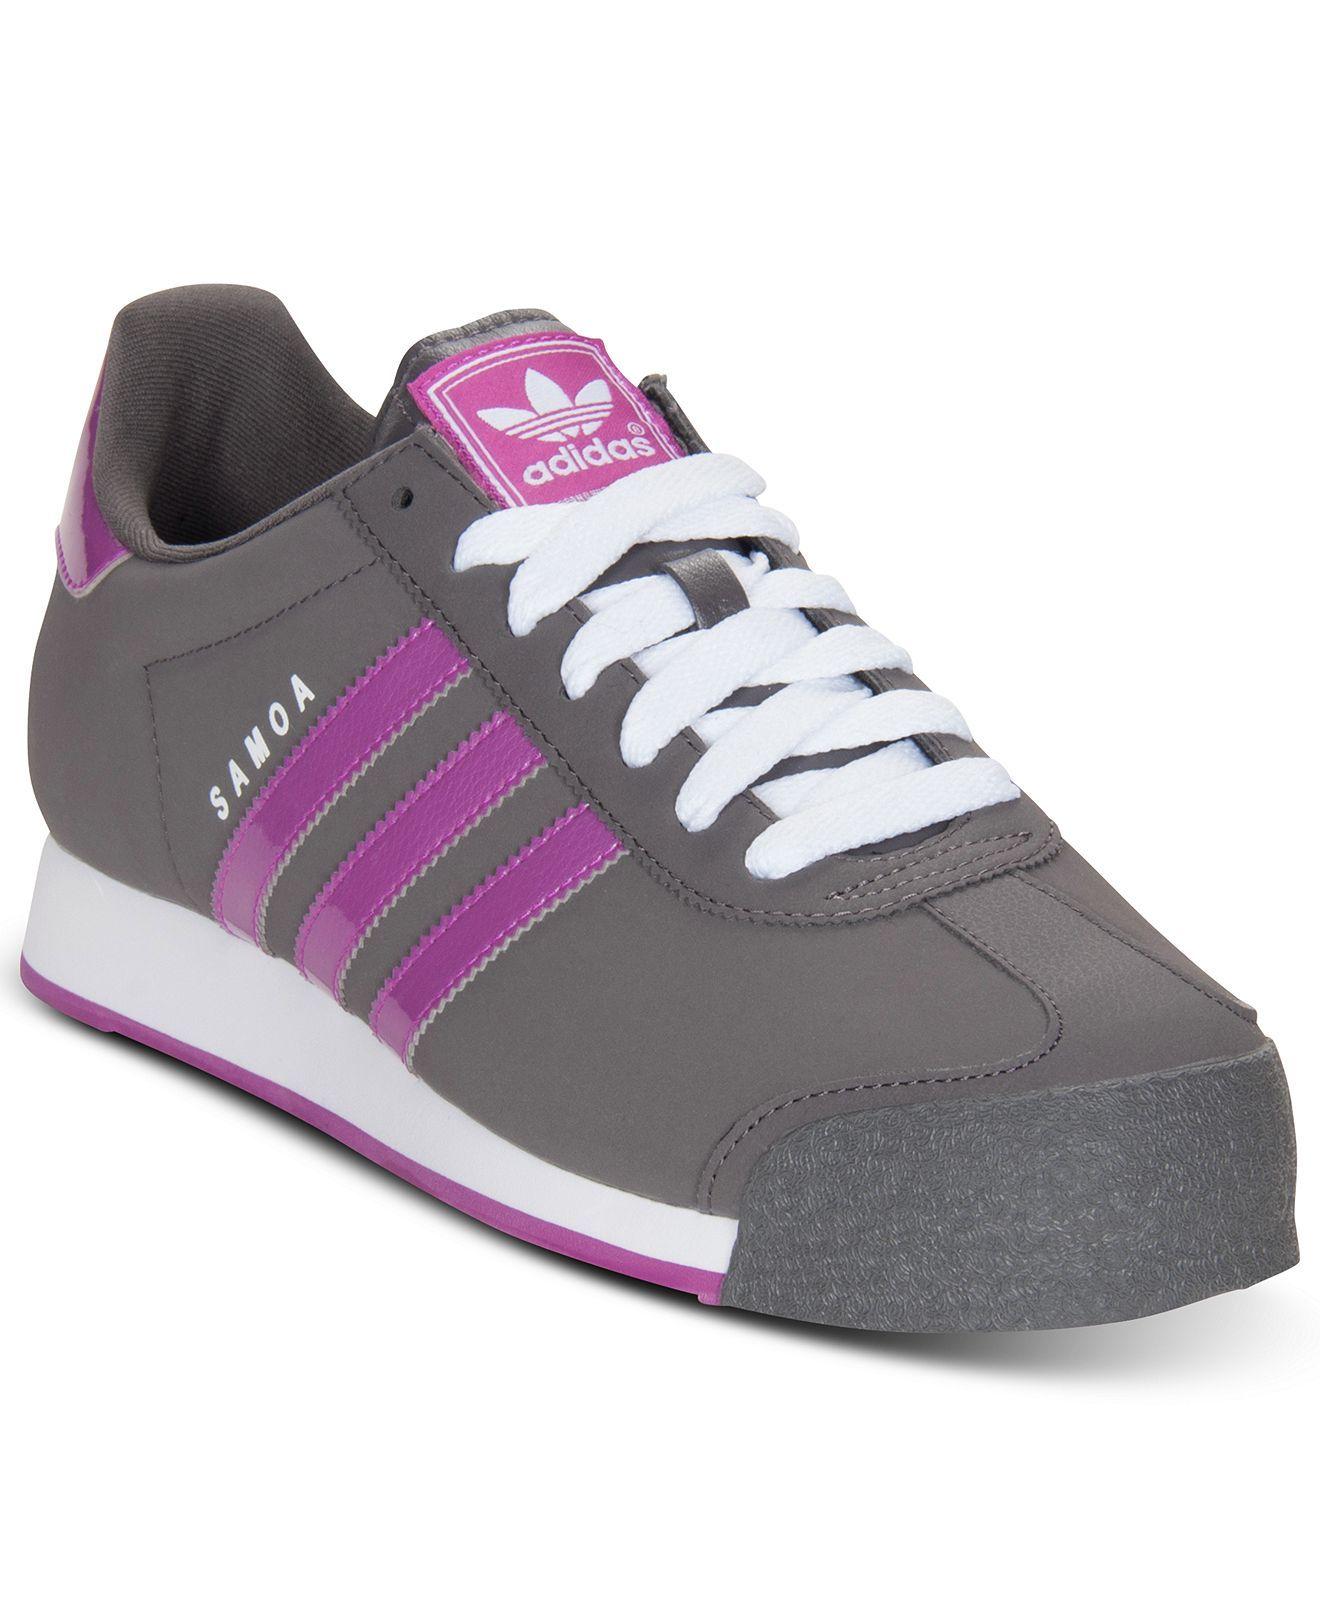 yeezyshoes in scarpe da ginnastica, atletica e adidas